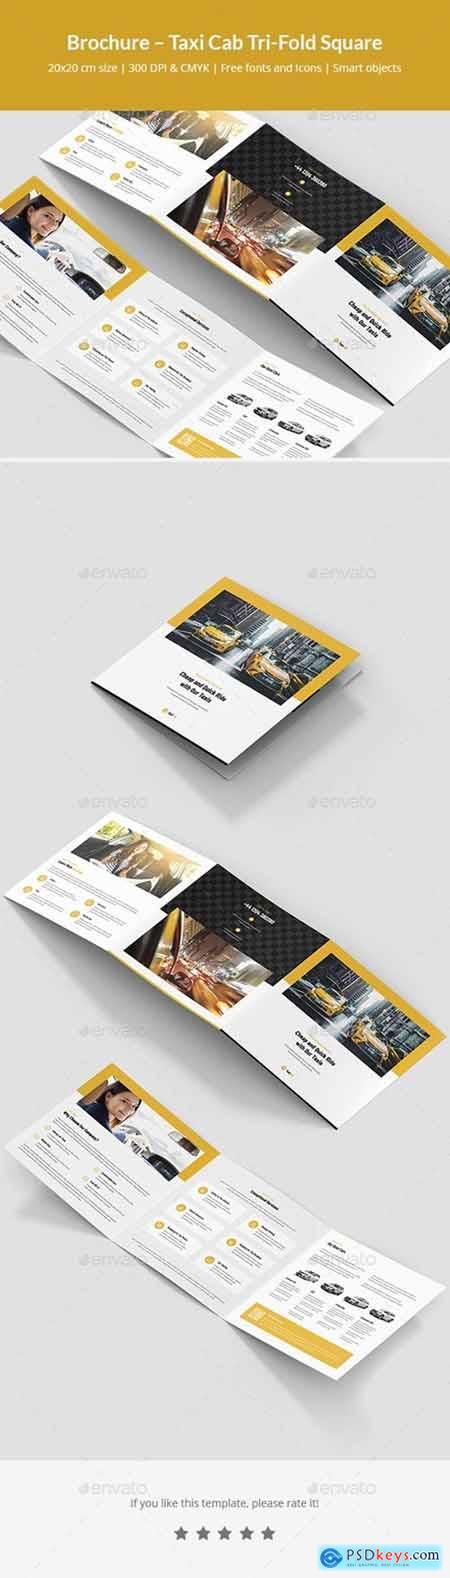 Brochure – Taxi Cab Tri-Fold Square 24820033